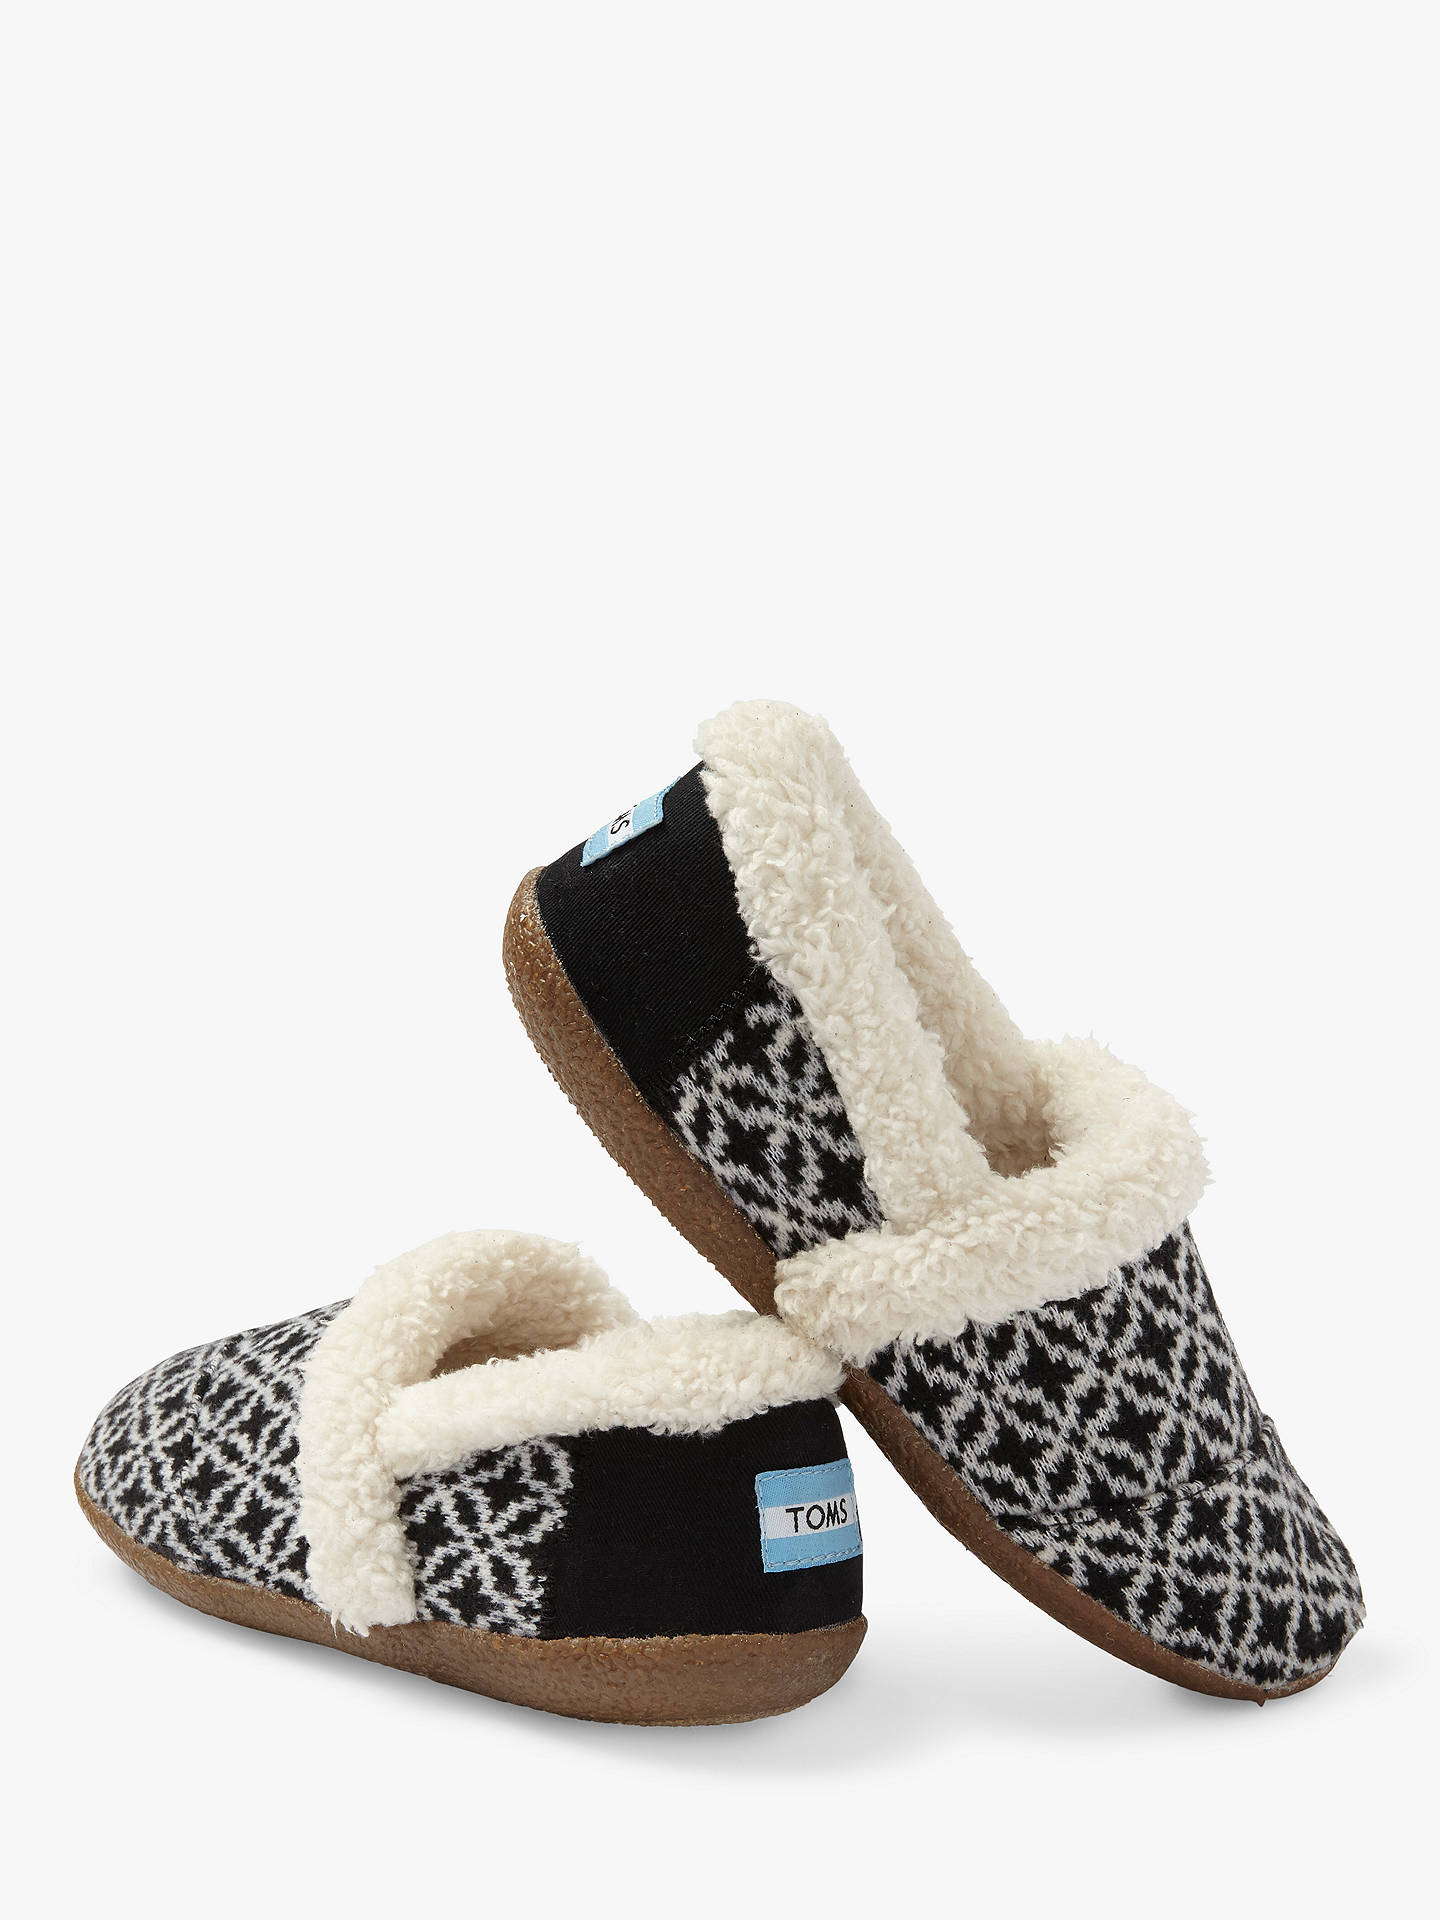 85ddda0d976 ... Buy TOMS Fair Isle Slippers